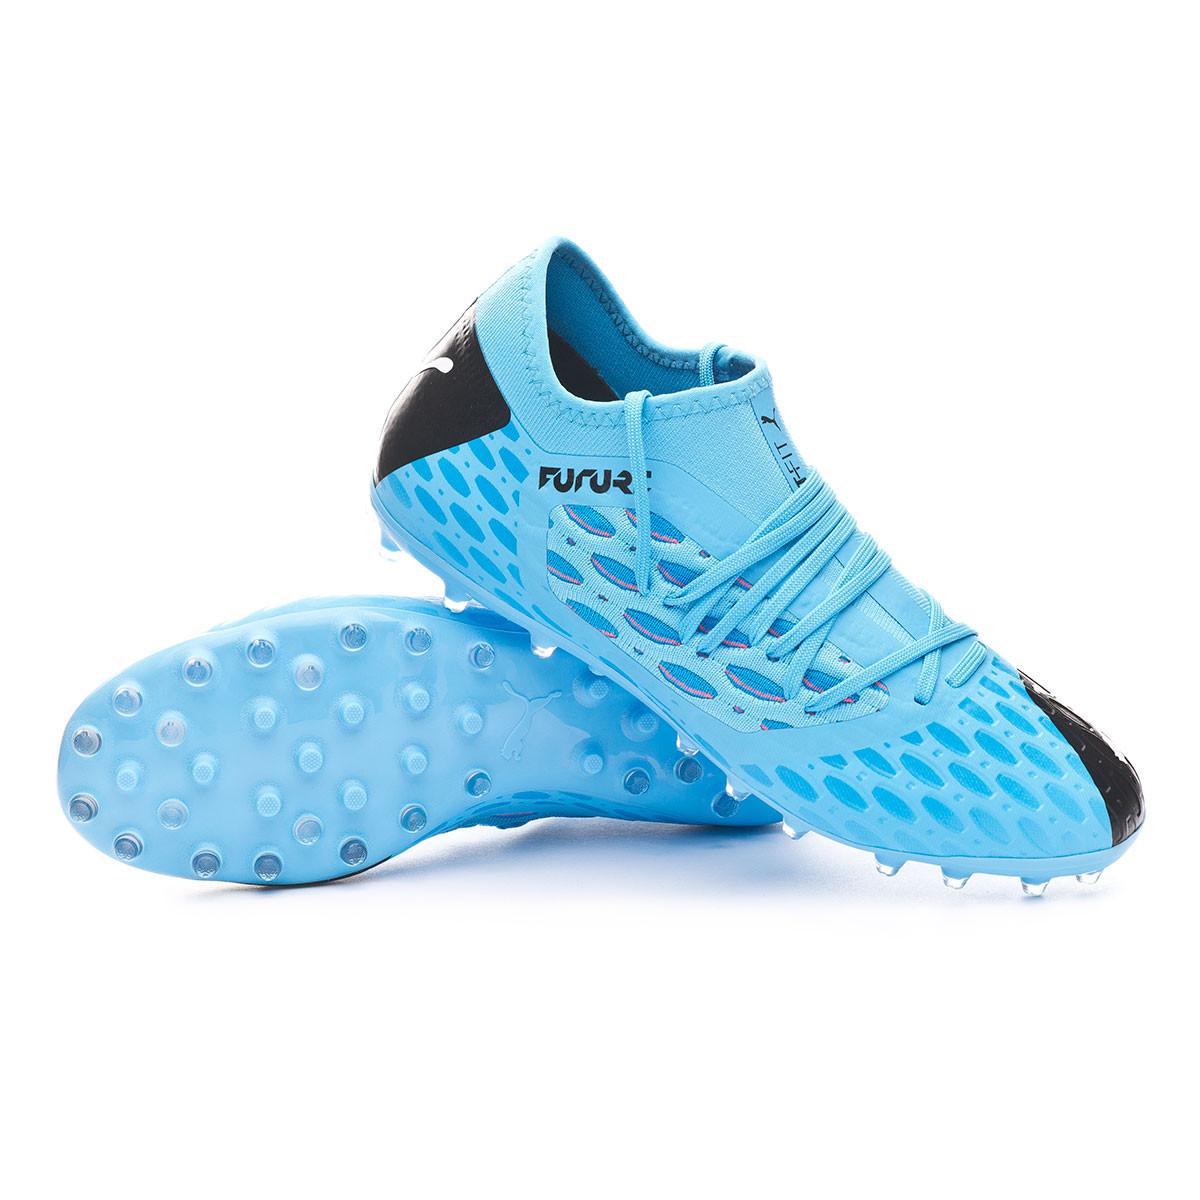 Puma Future 5.3 NETFIT MG Football Boots